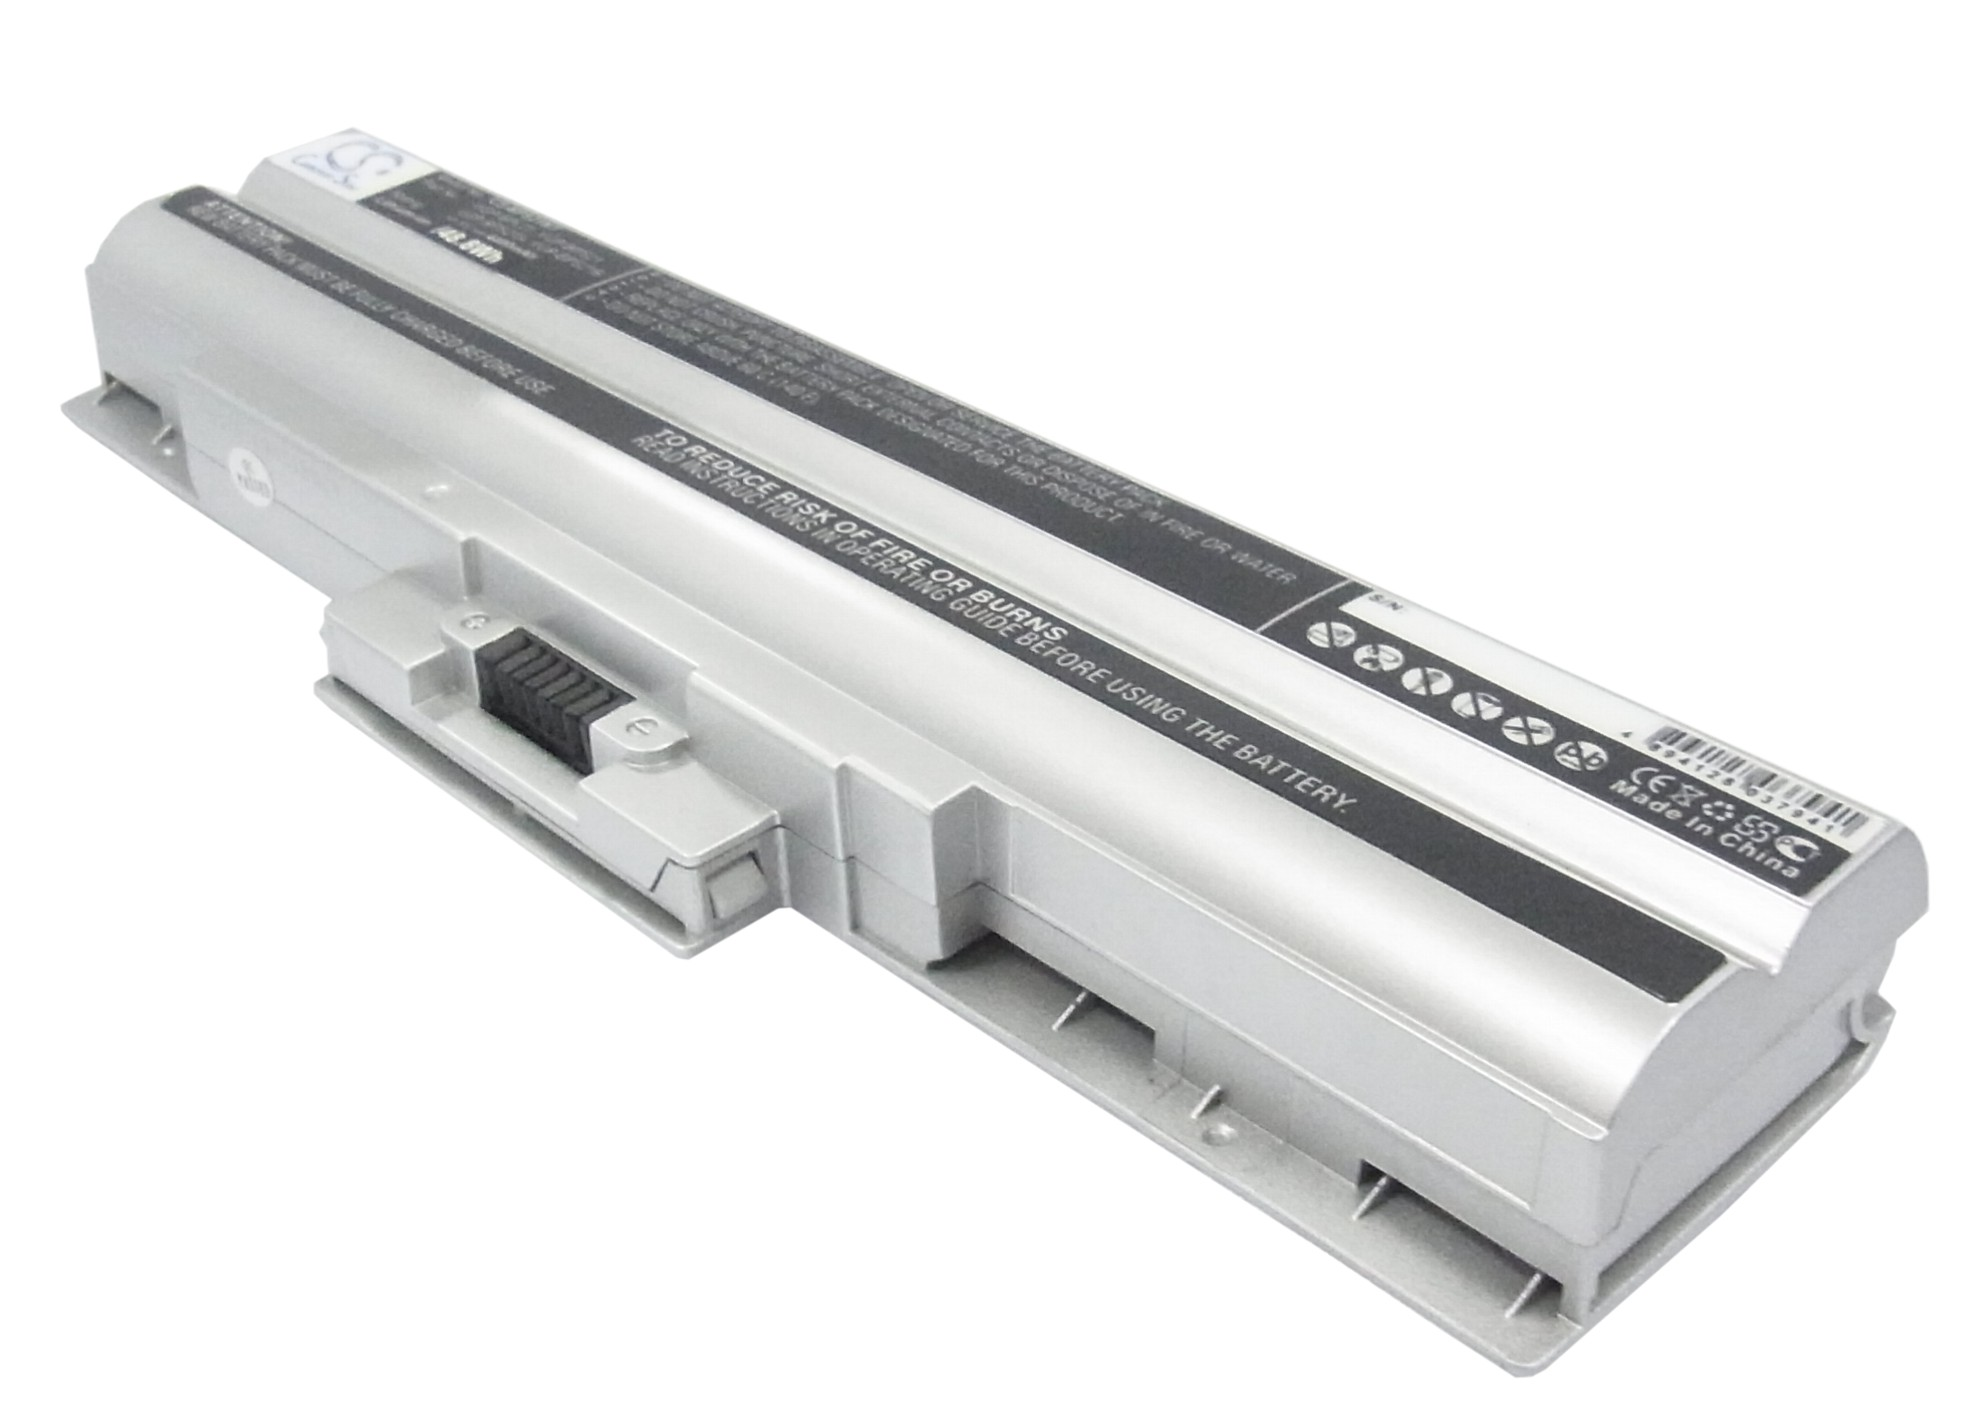 Cameron Sino baterie do notebooků pro SONY VAIO VGN-CS36GJ/U 11.1V Li-ion 4400mAh stříbrná - neoriginální